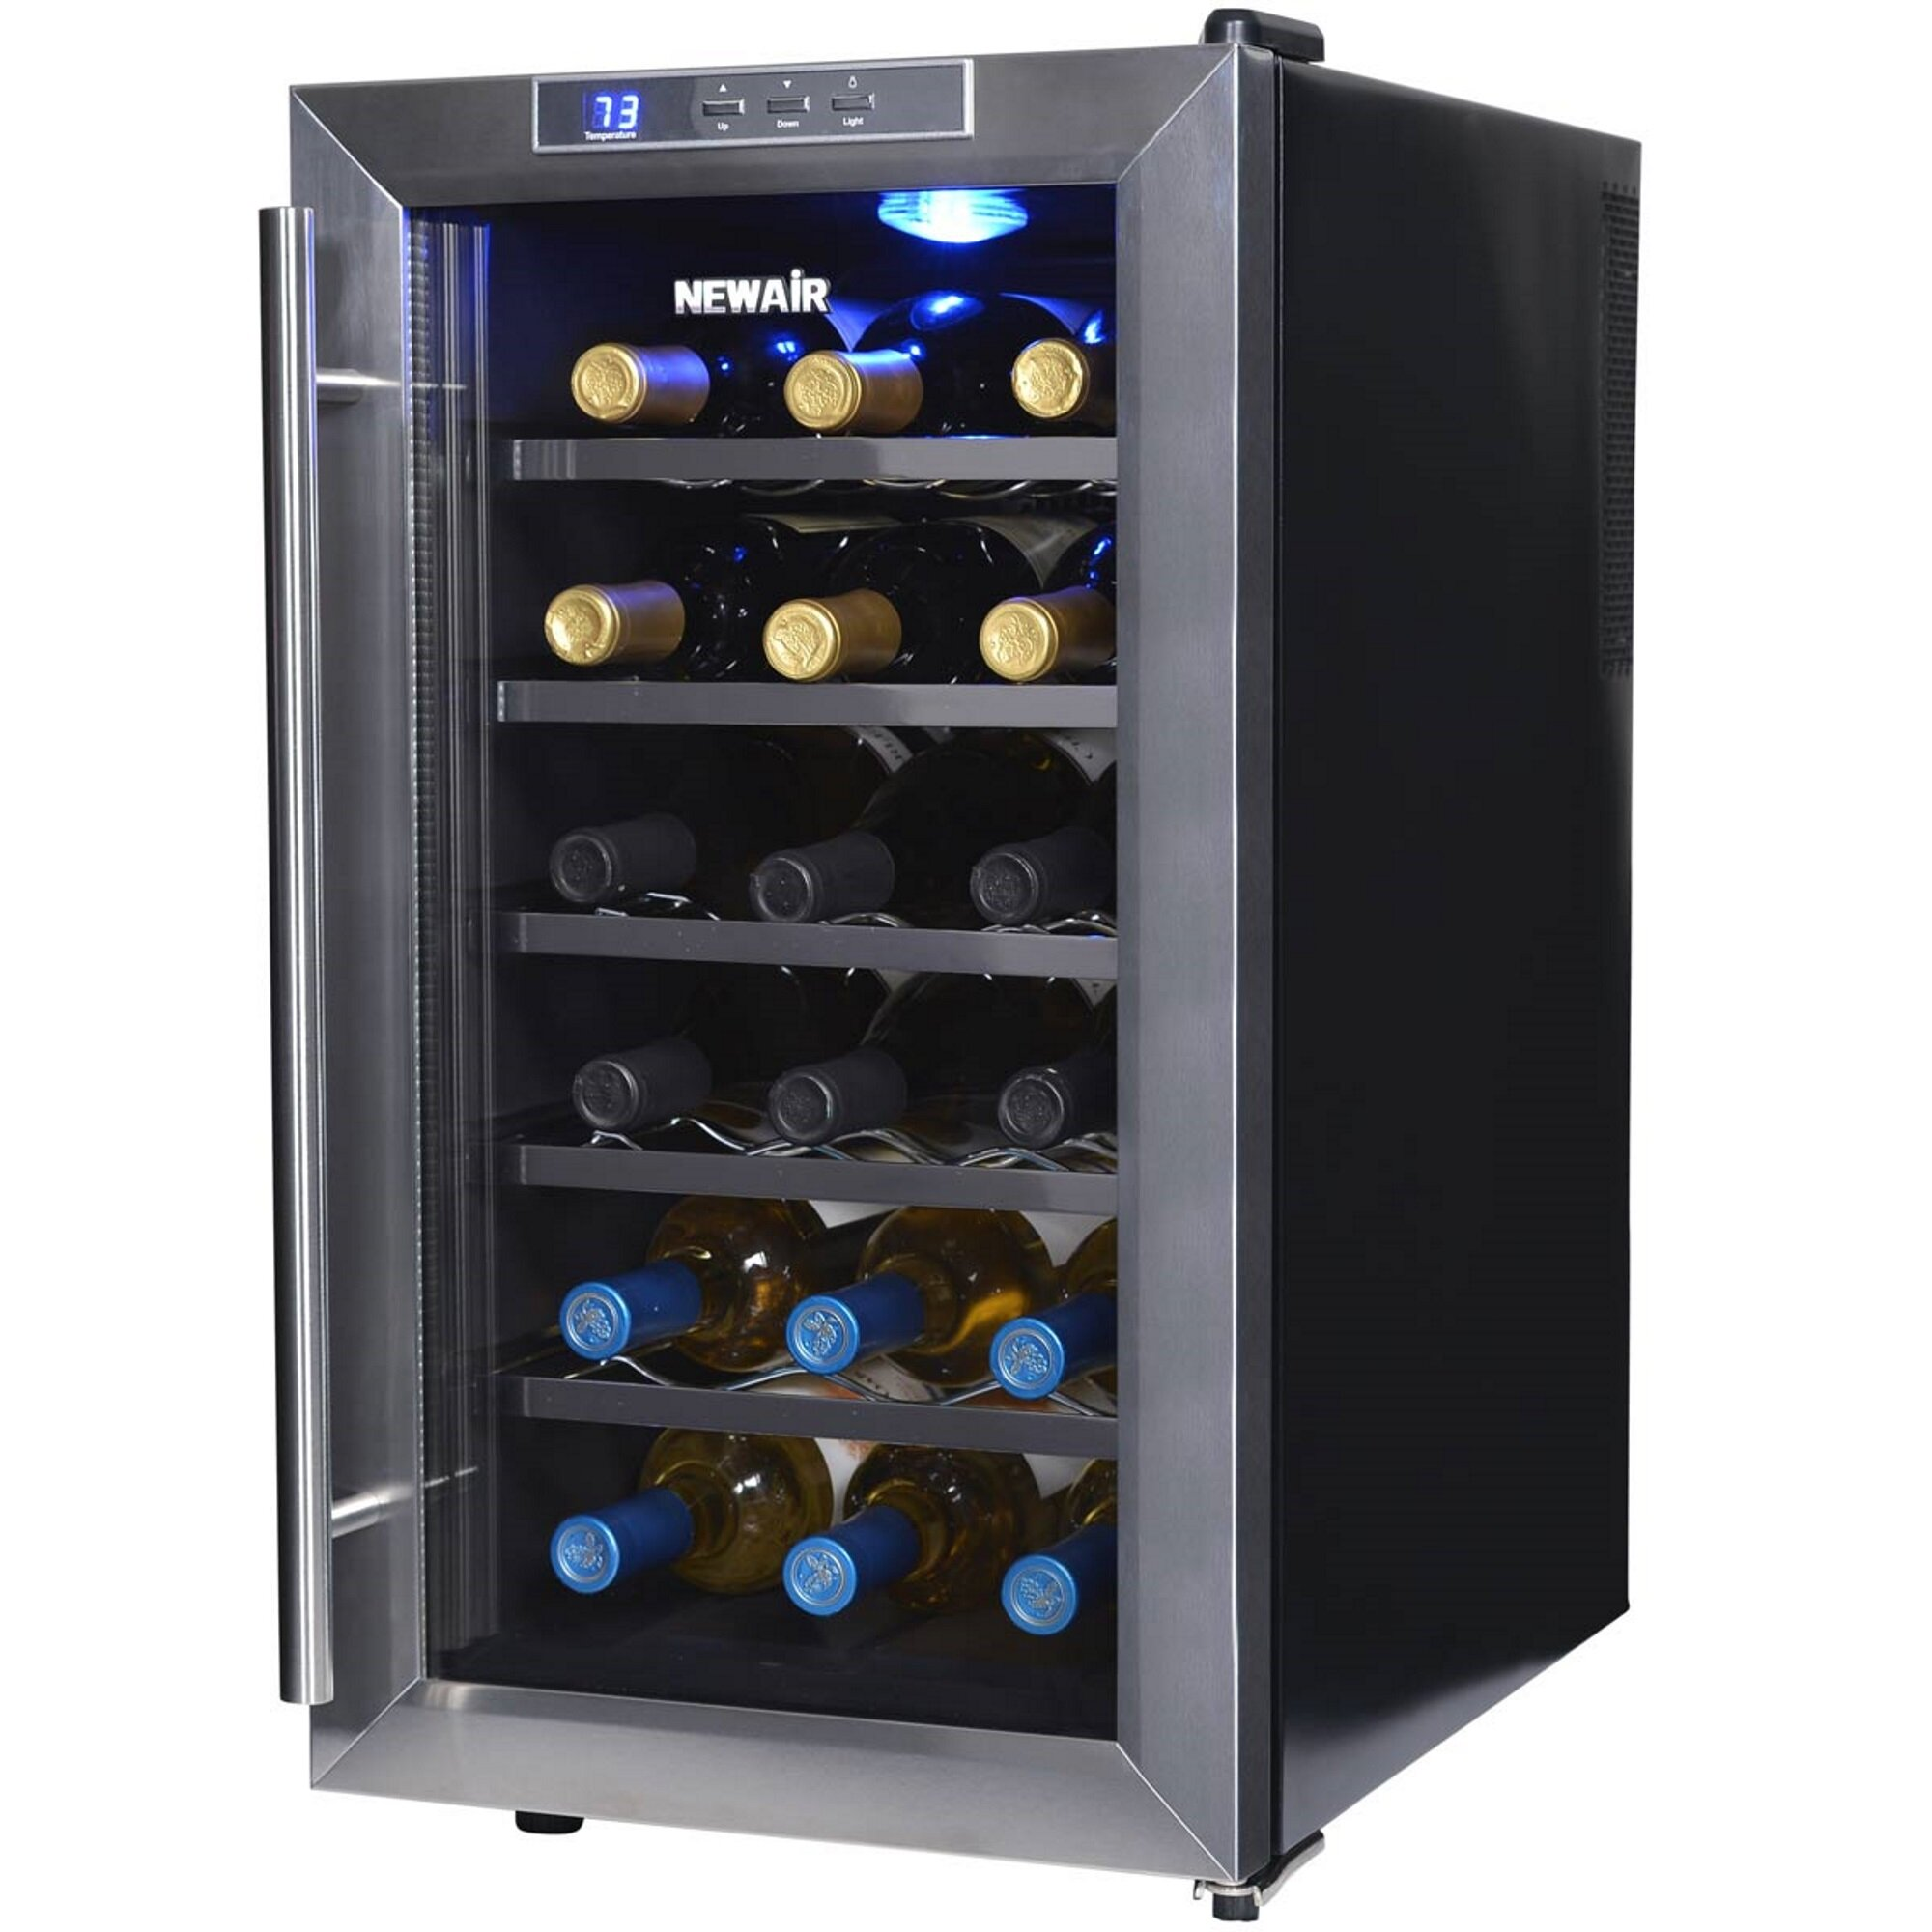 Newair 18 Bottle Single Zone Freestanding Wine Cooler